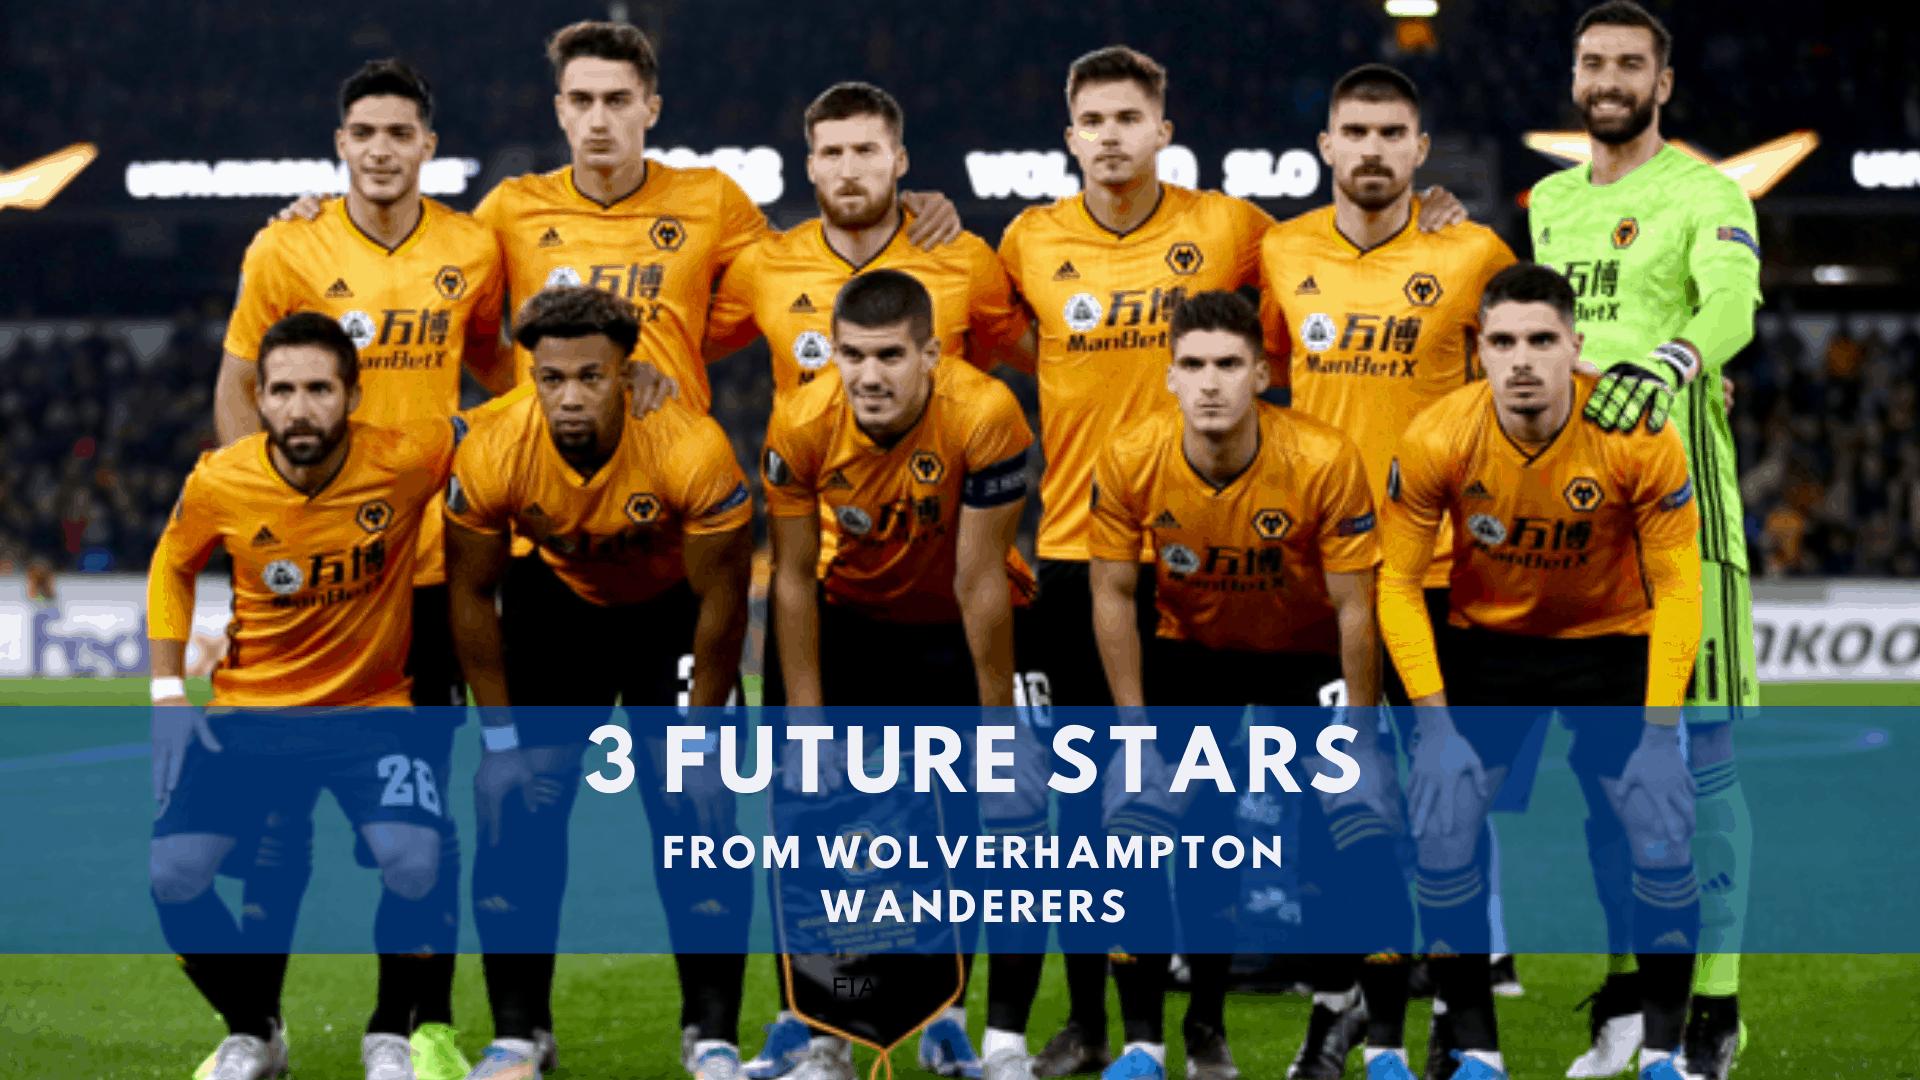 Wolves Future Stars